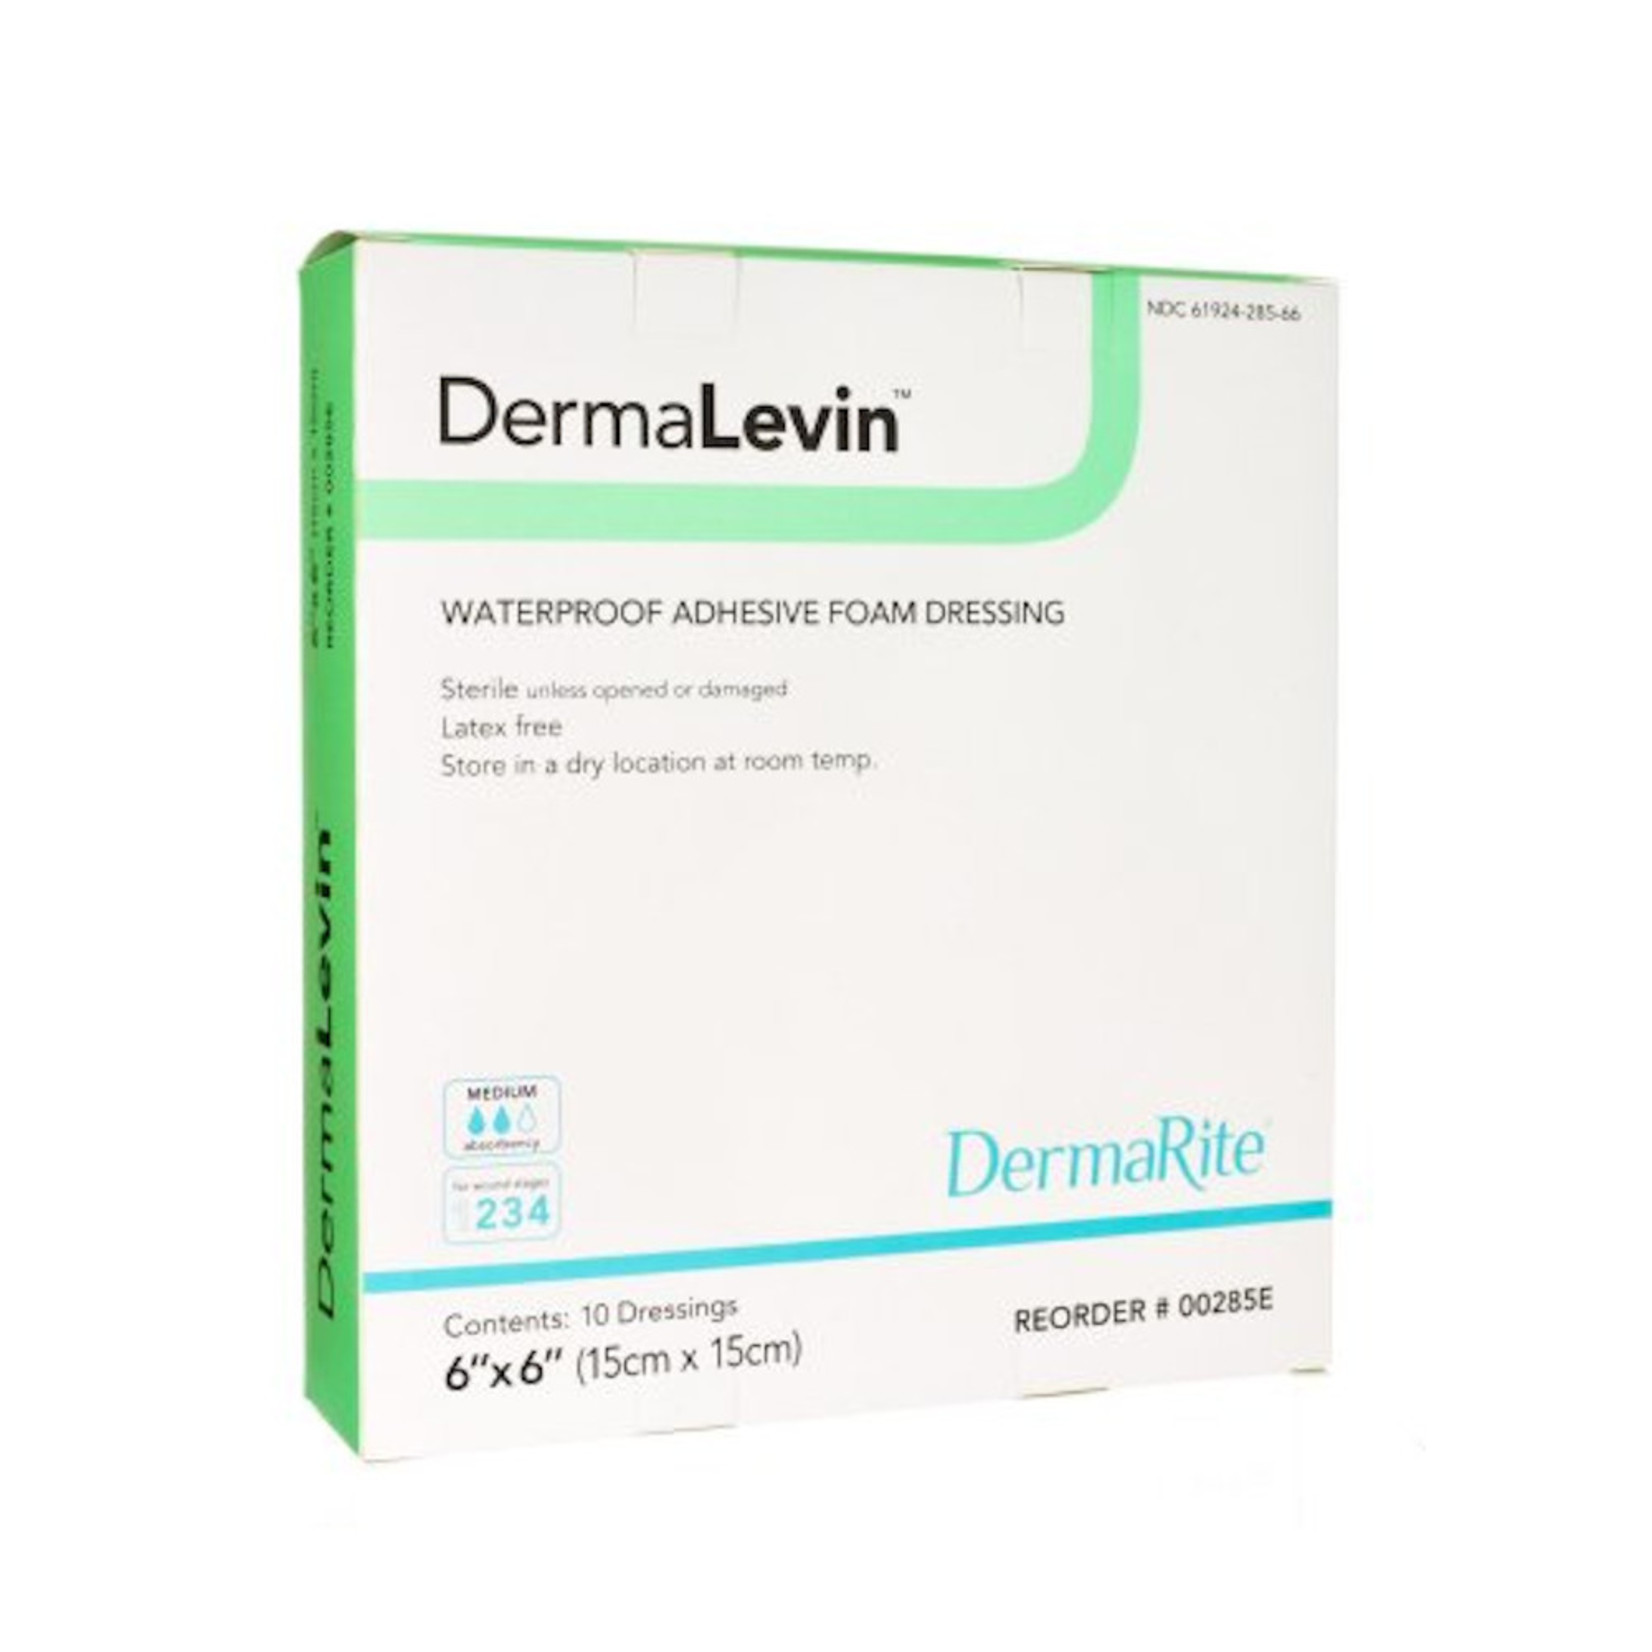 DermaLevin foam Adh 4x4